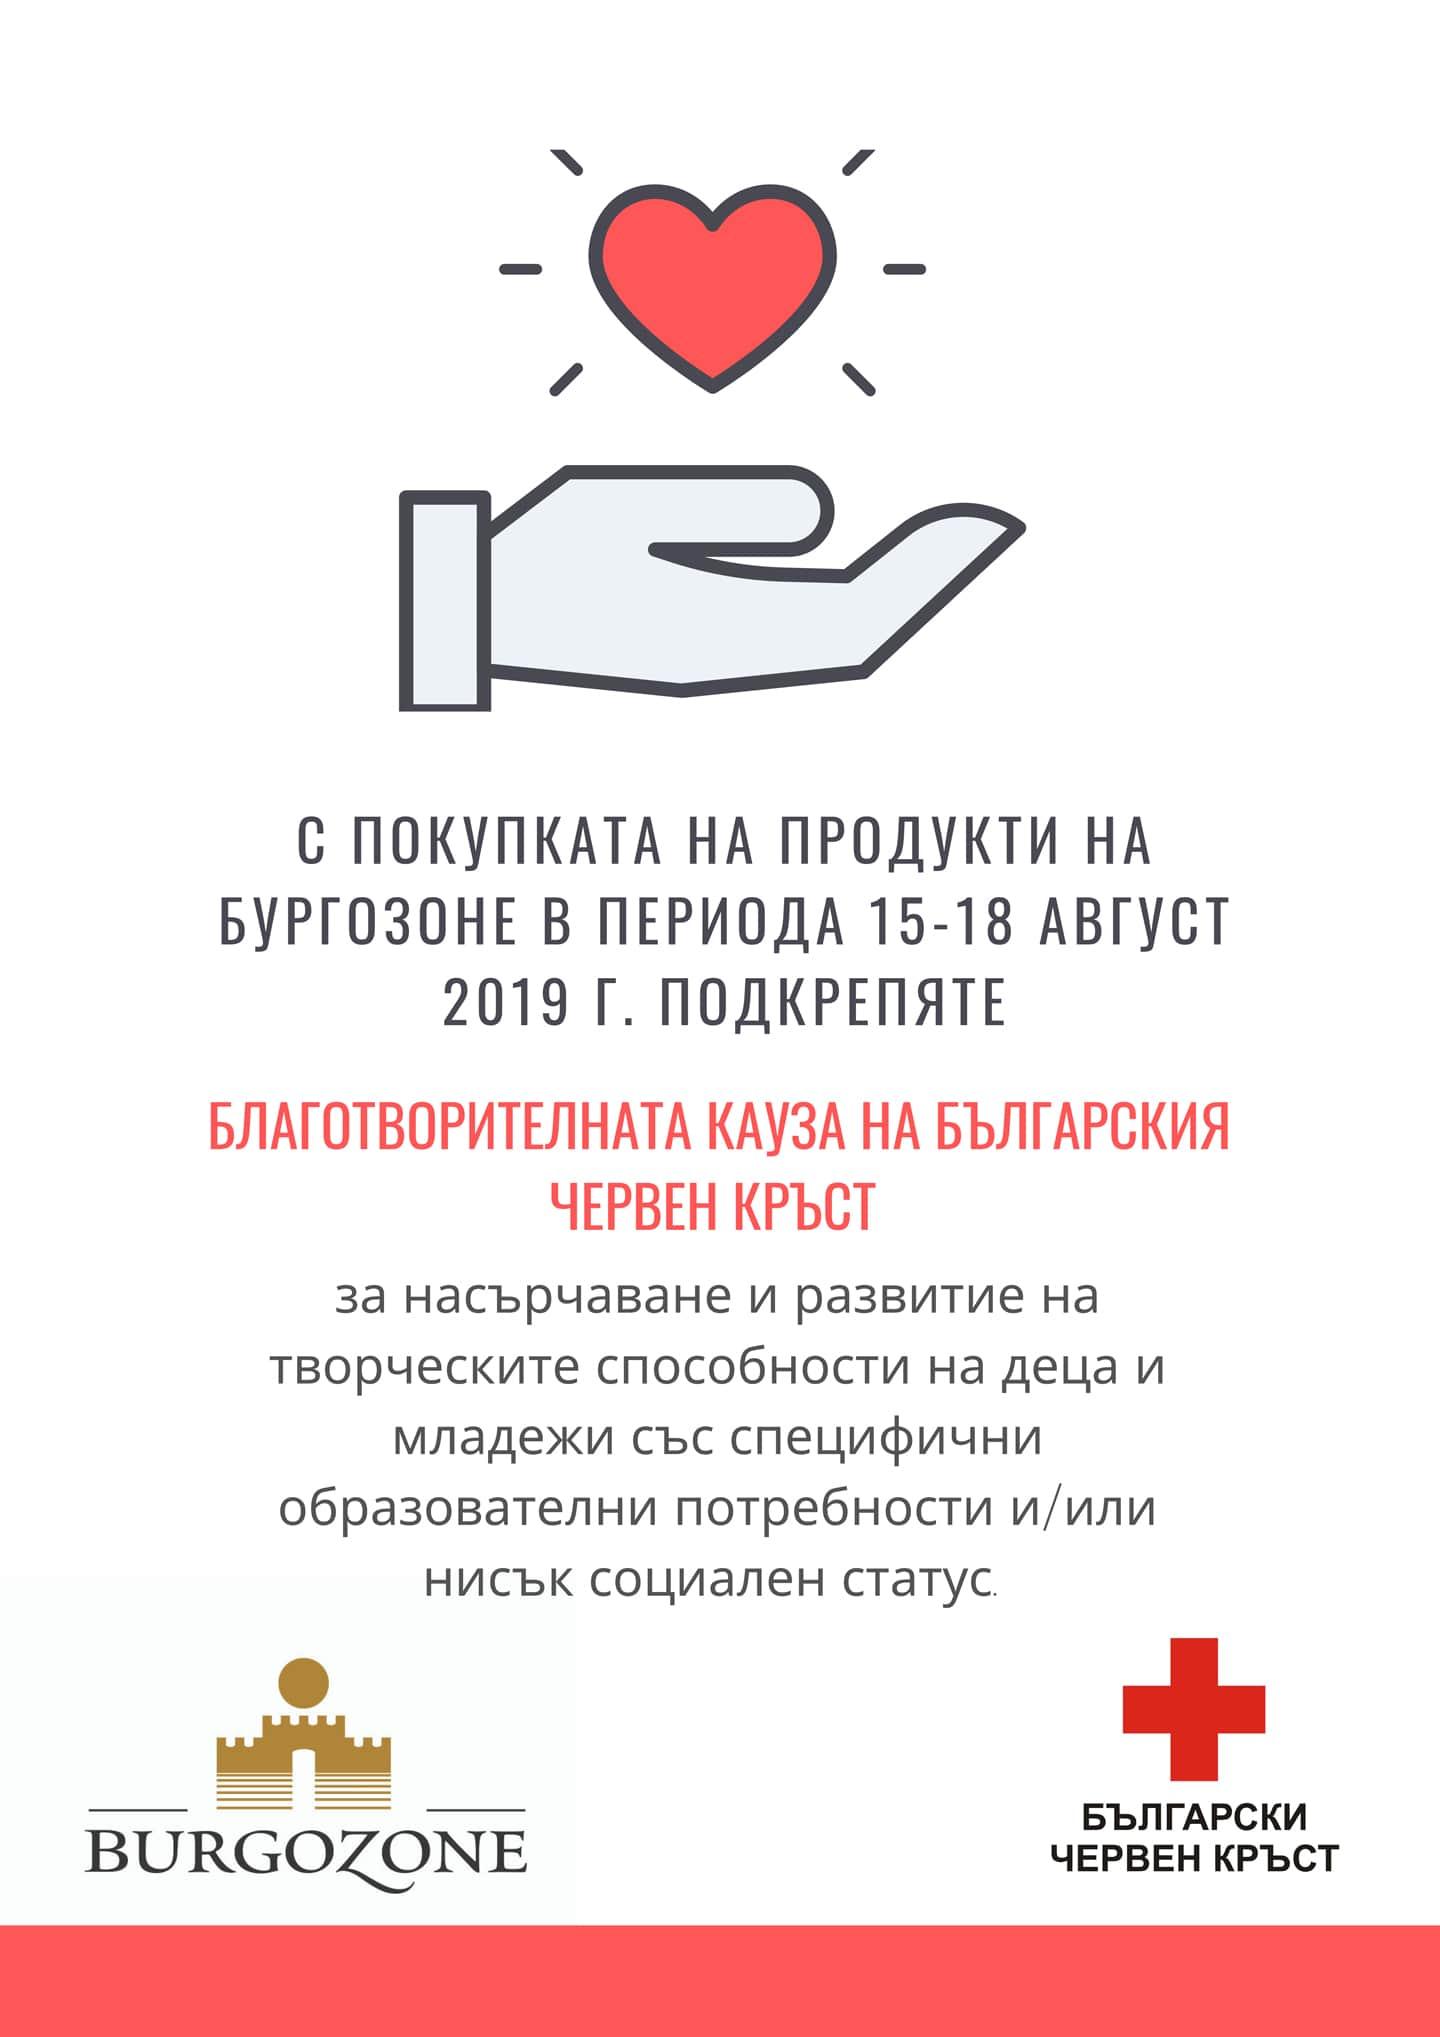 Бургозоне кампания Оряхово БЧК